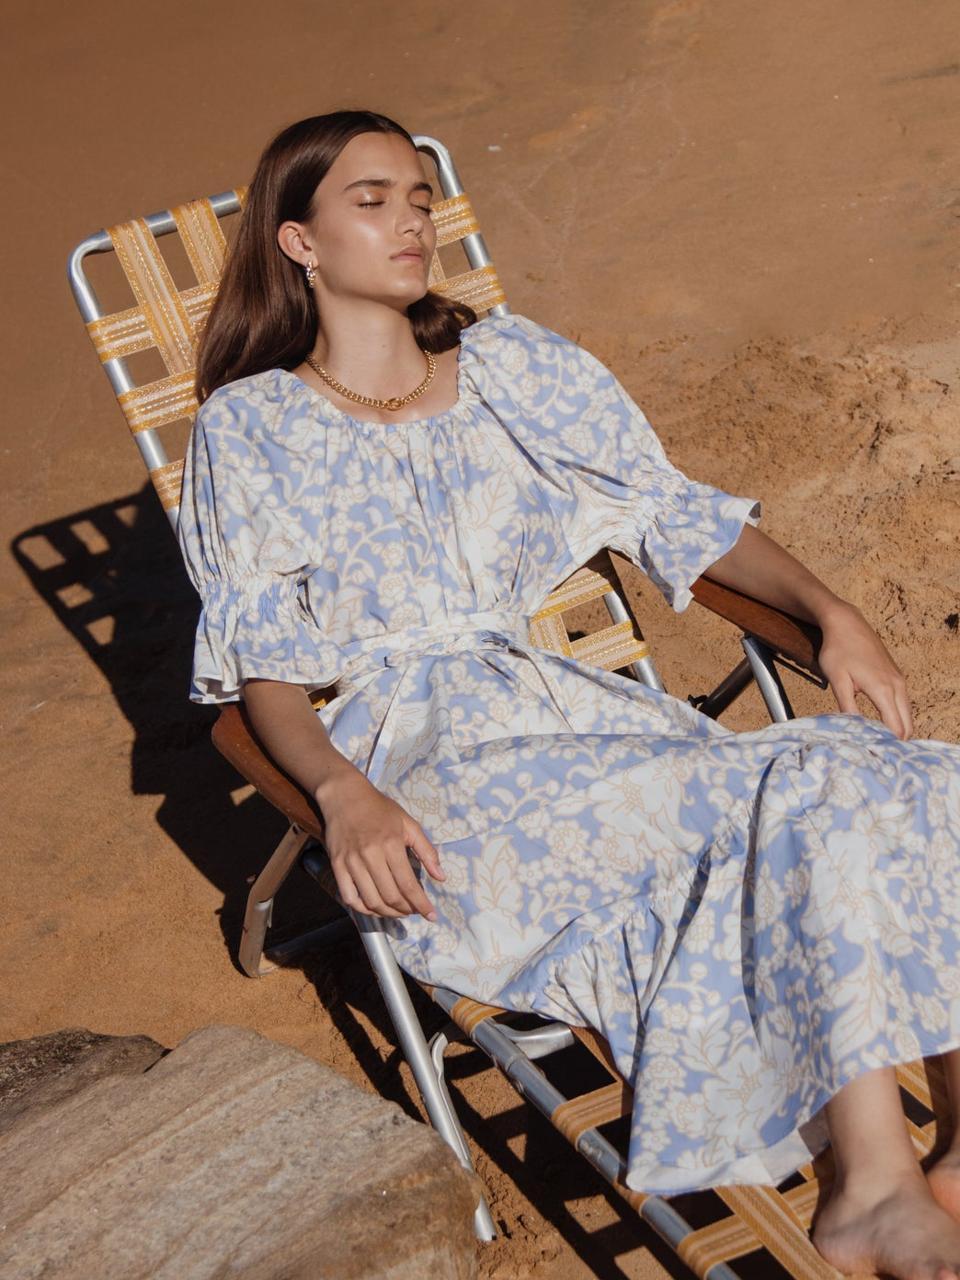 Malibu Waist-Tie Floral-Print Cotton Maxi Dress by Ephemera